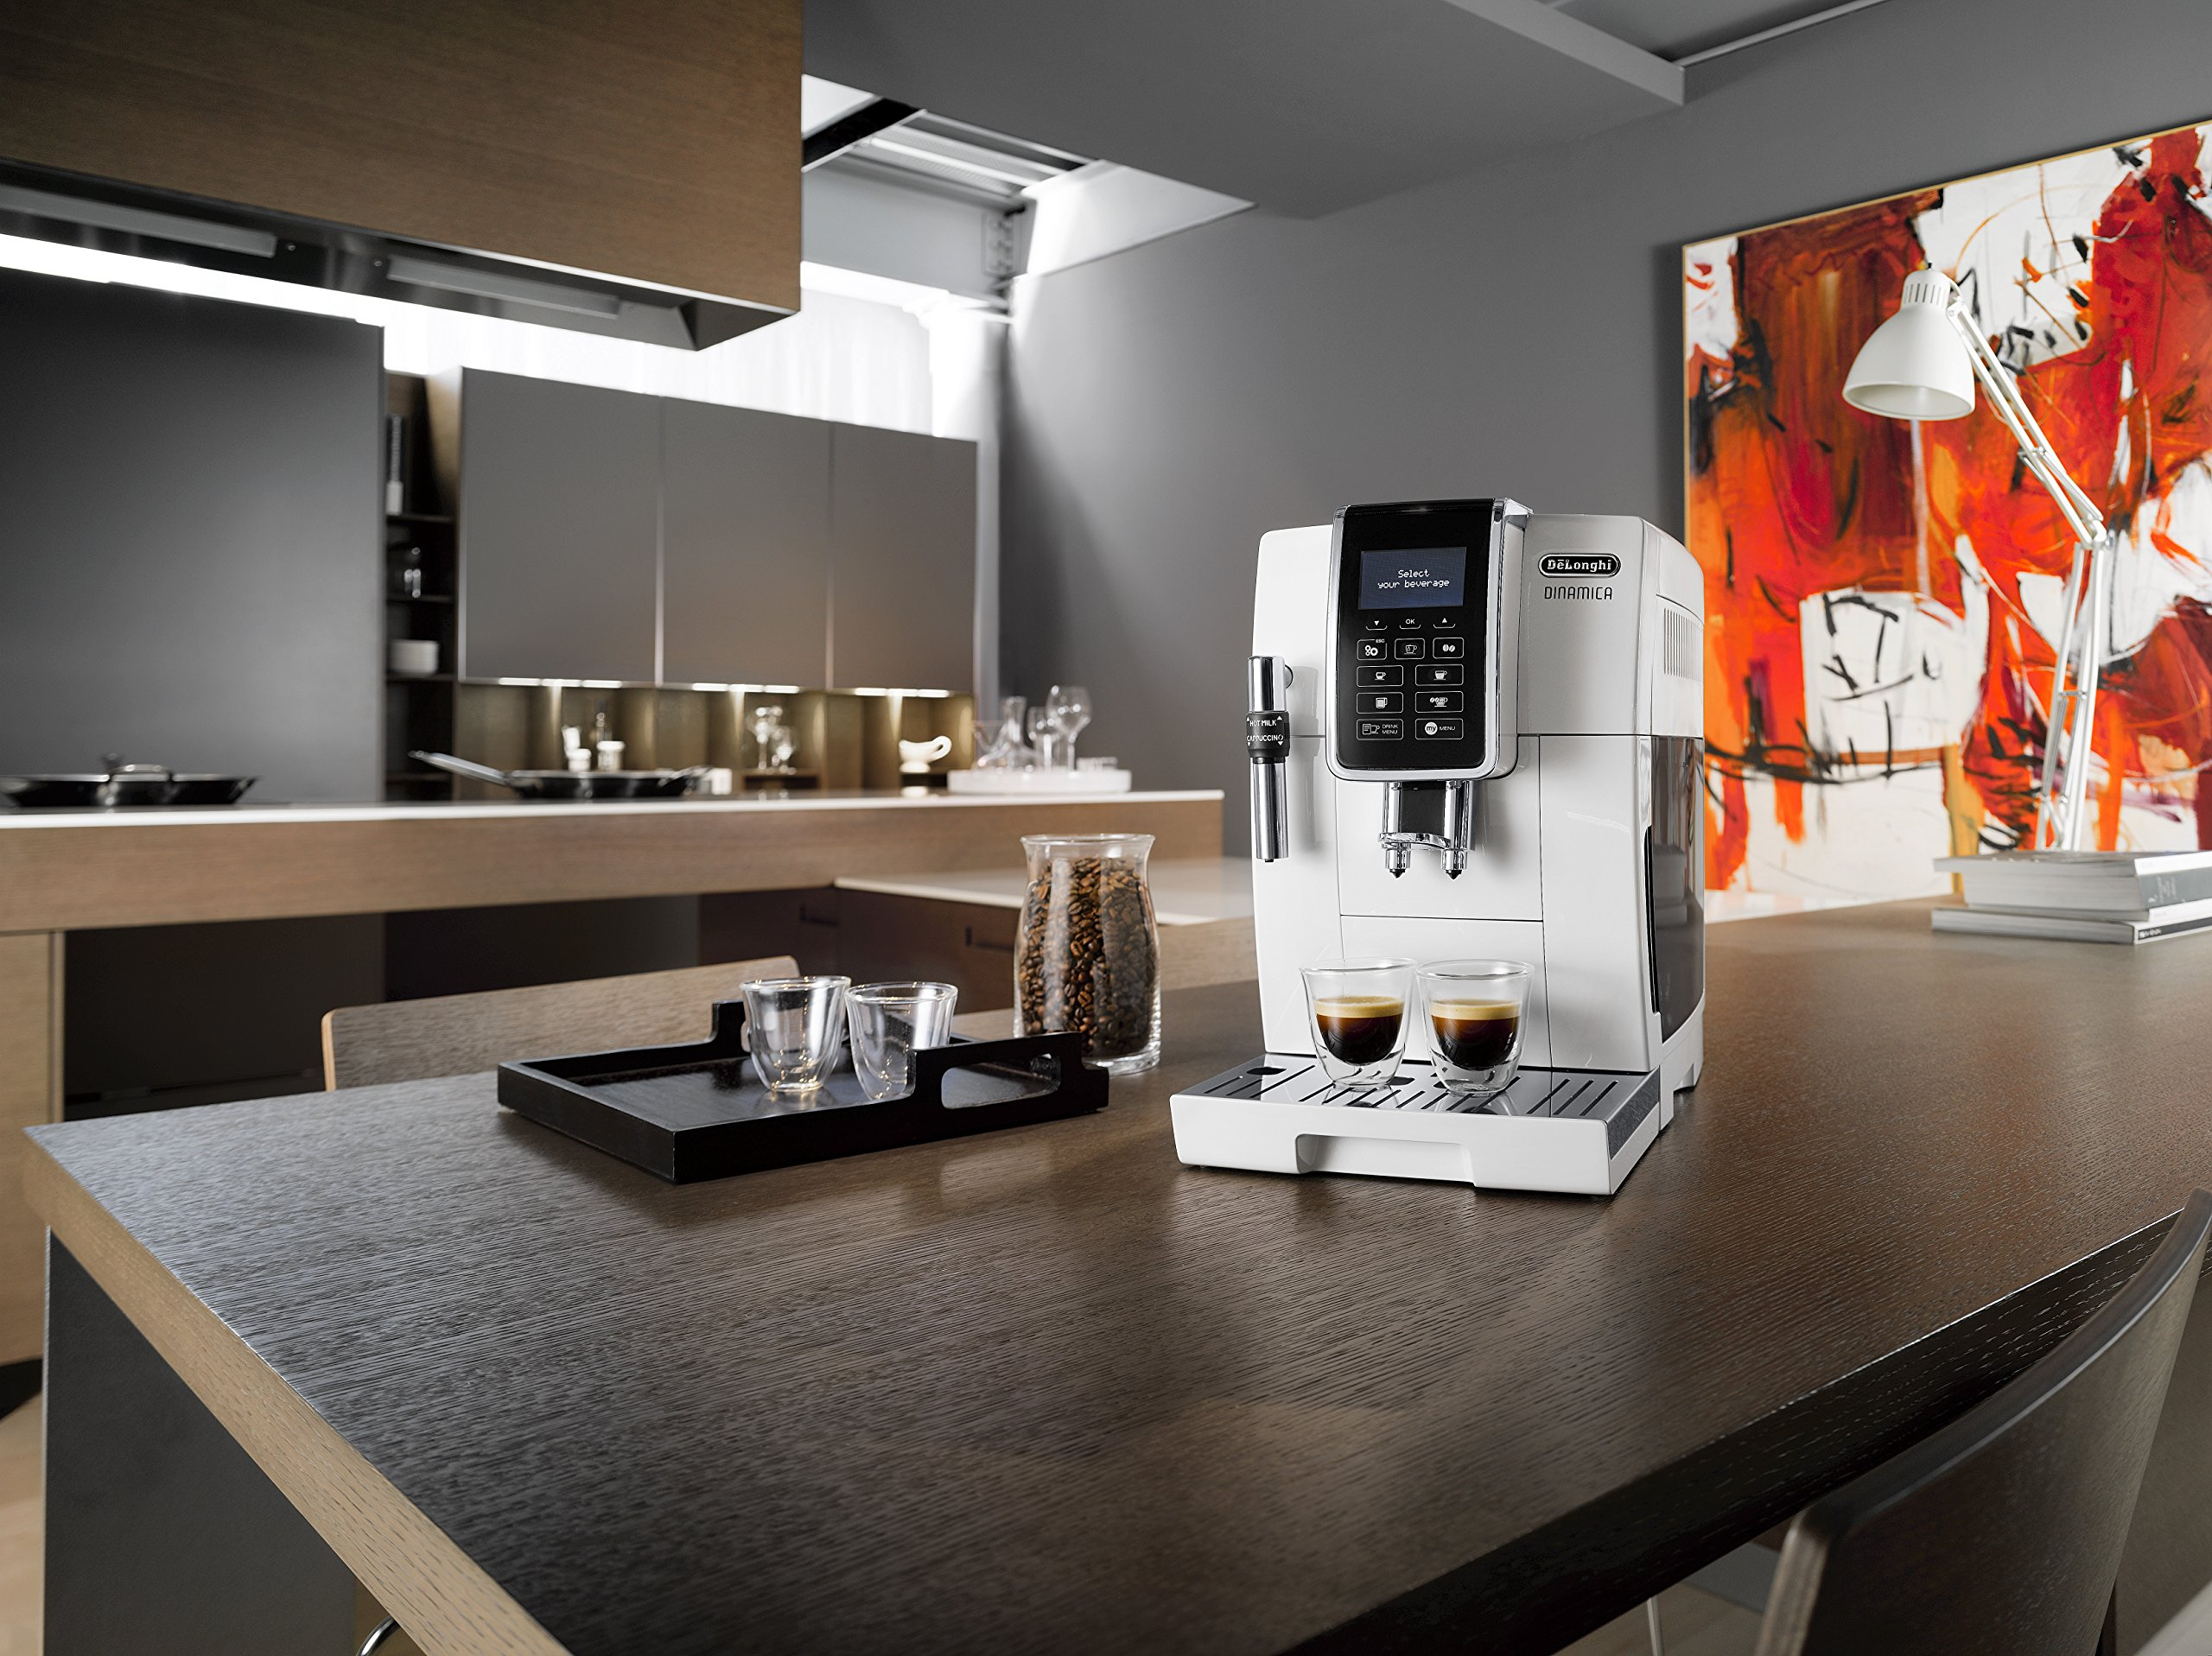 De'Longhi Dinamica, Fully Automatic Bean to Cup Coffee Machine, Cappuccino, Espresso Coffee Maker, ECAM 350.35.W, White